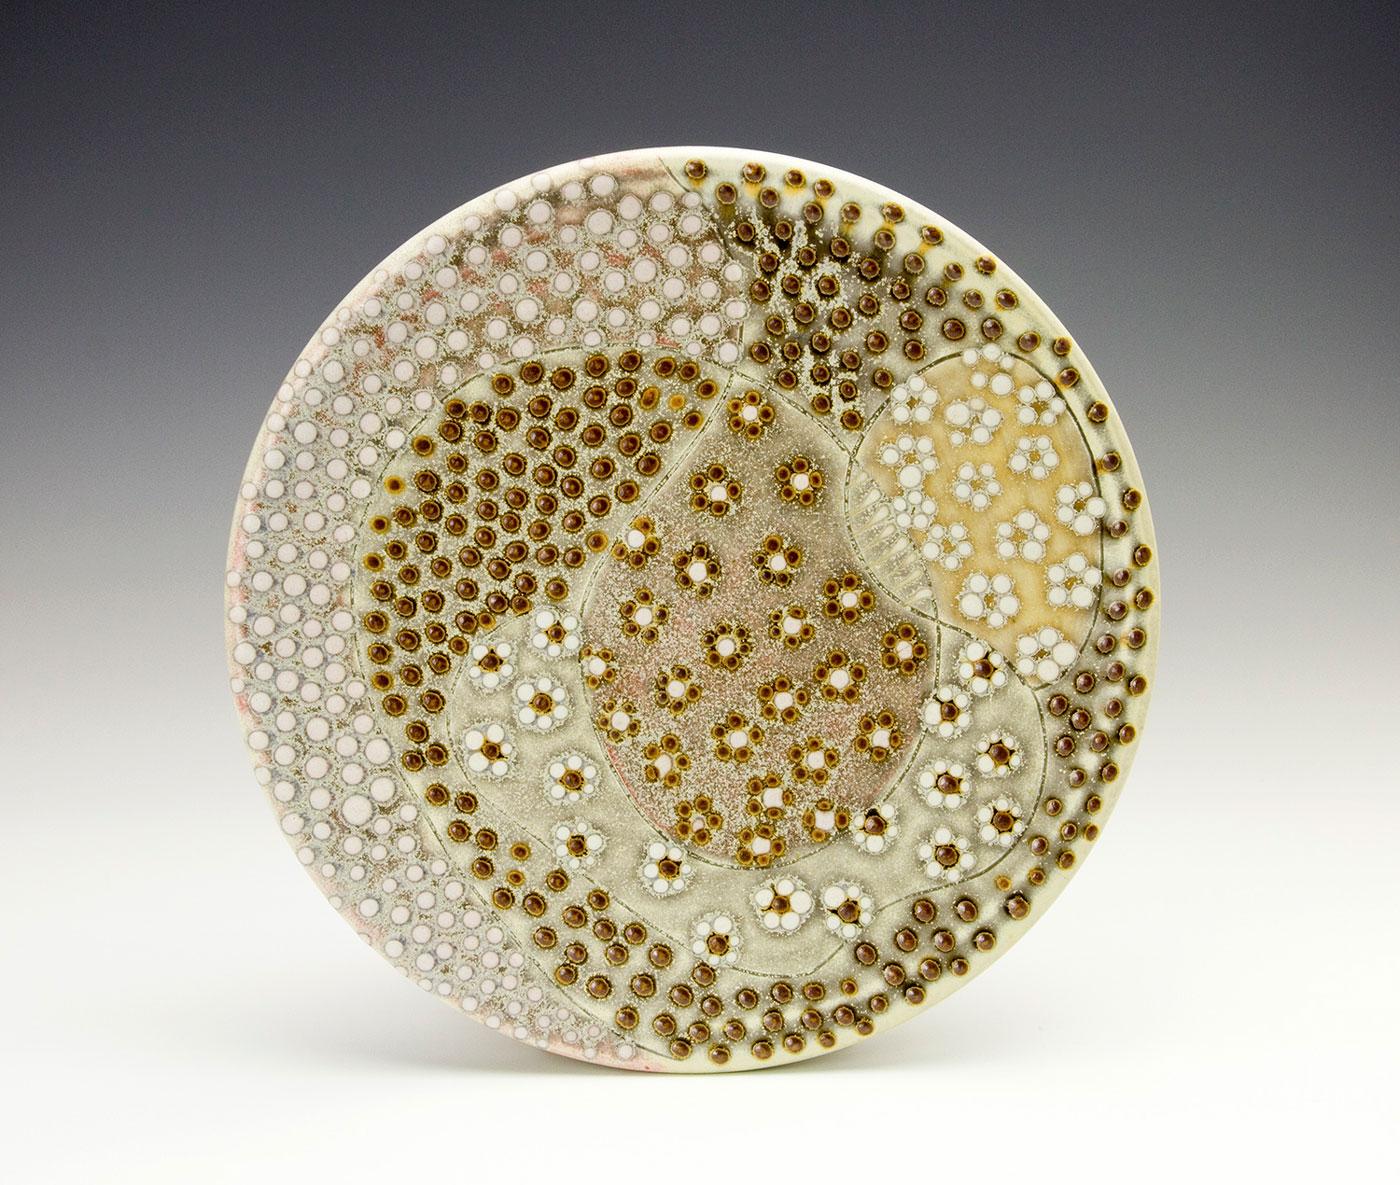 Pattern-Medley-studio-art-plate-Samantha-Henneke-Seagrove-North-Carolina.jpg